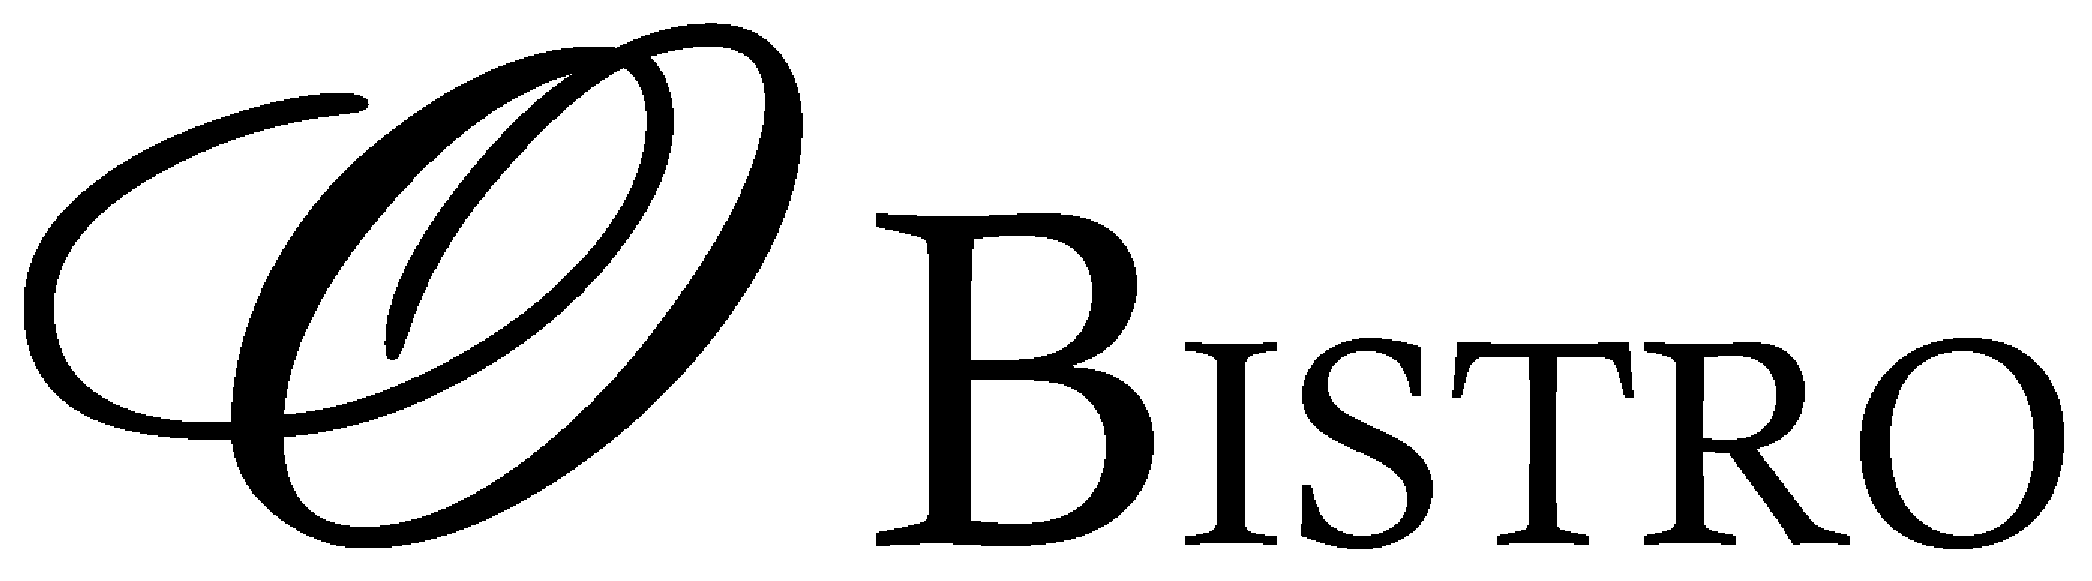 OBistro-Logo